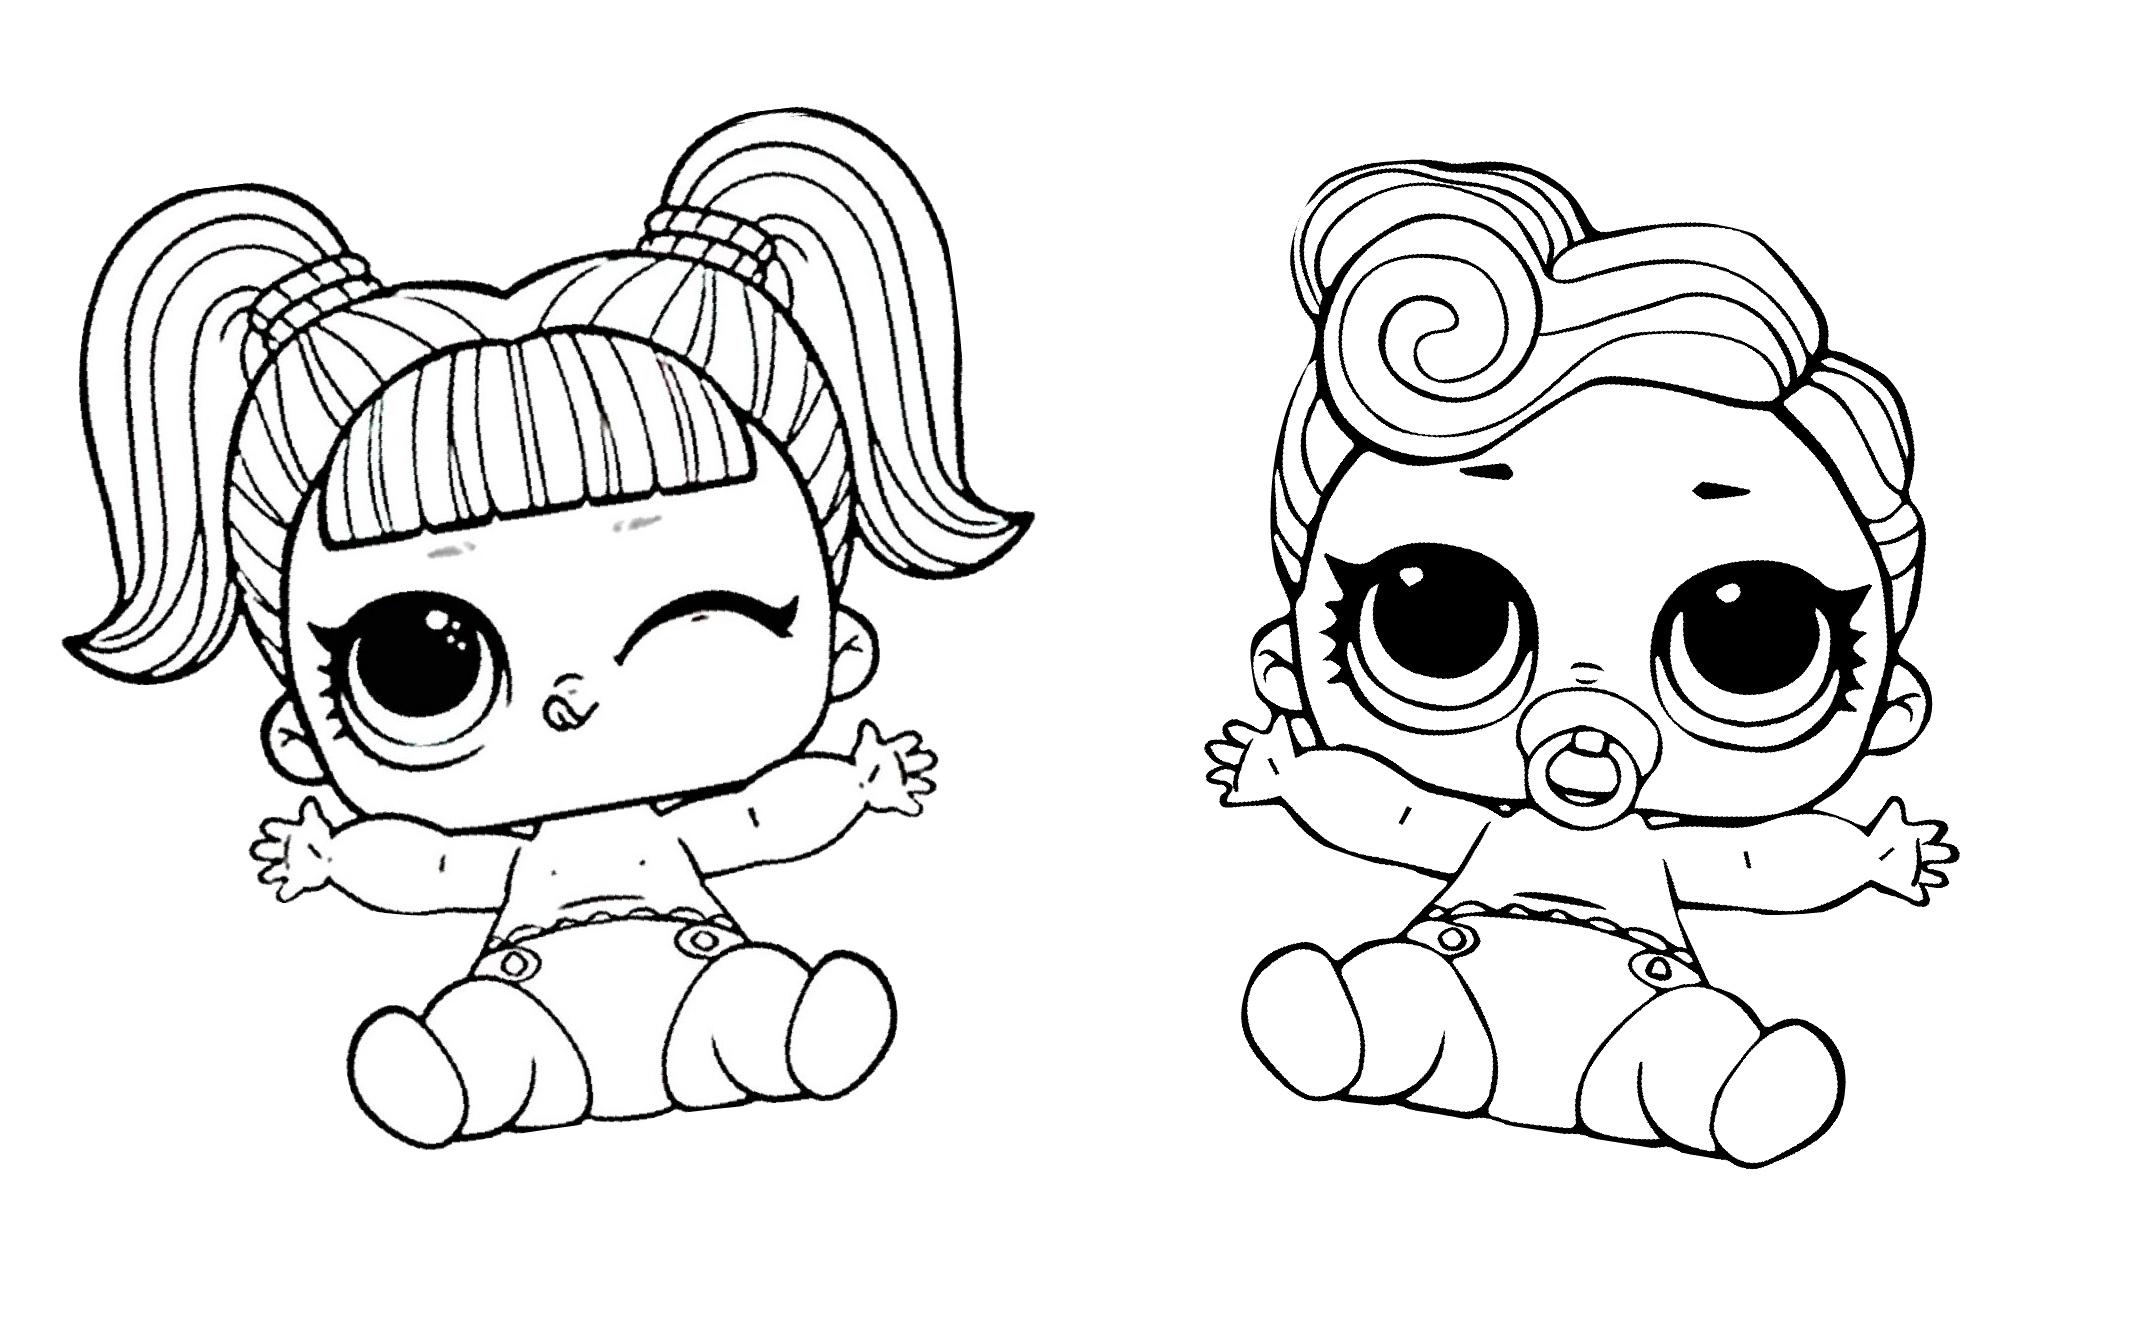 18 LOL Coloring Pages: Cute Printable Surprise Dolls - Print Color Craft